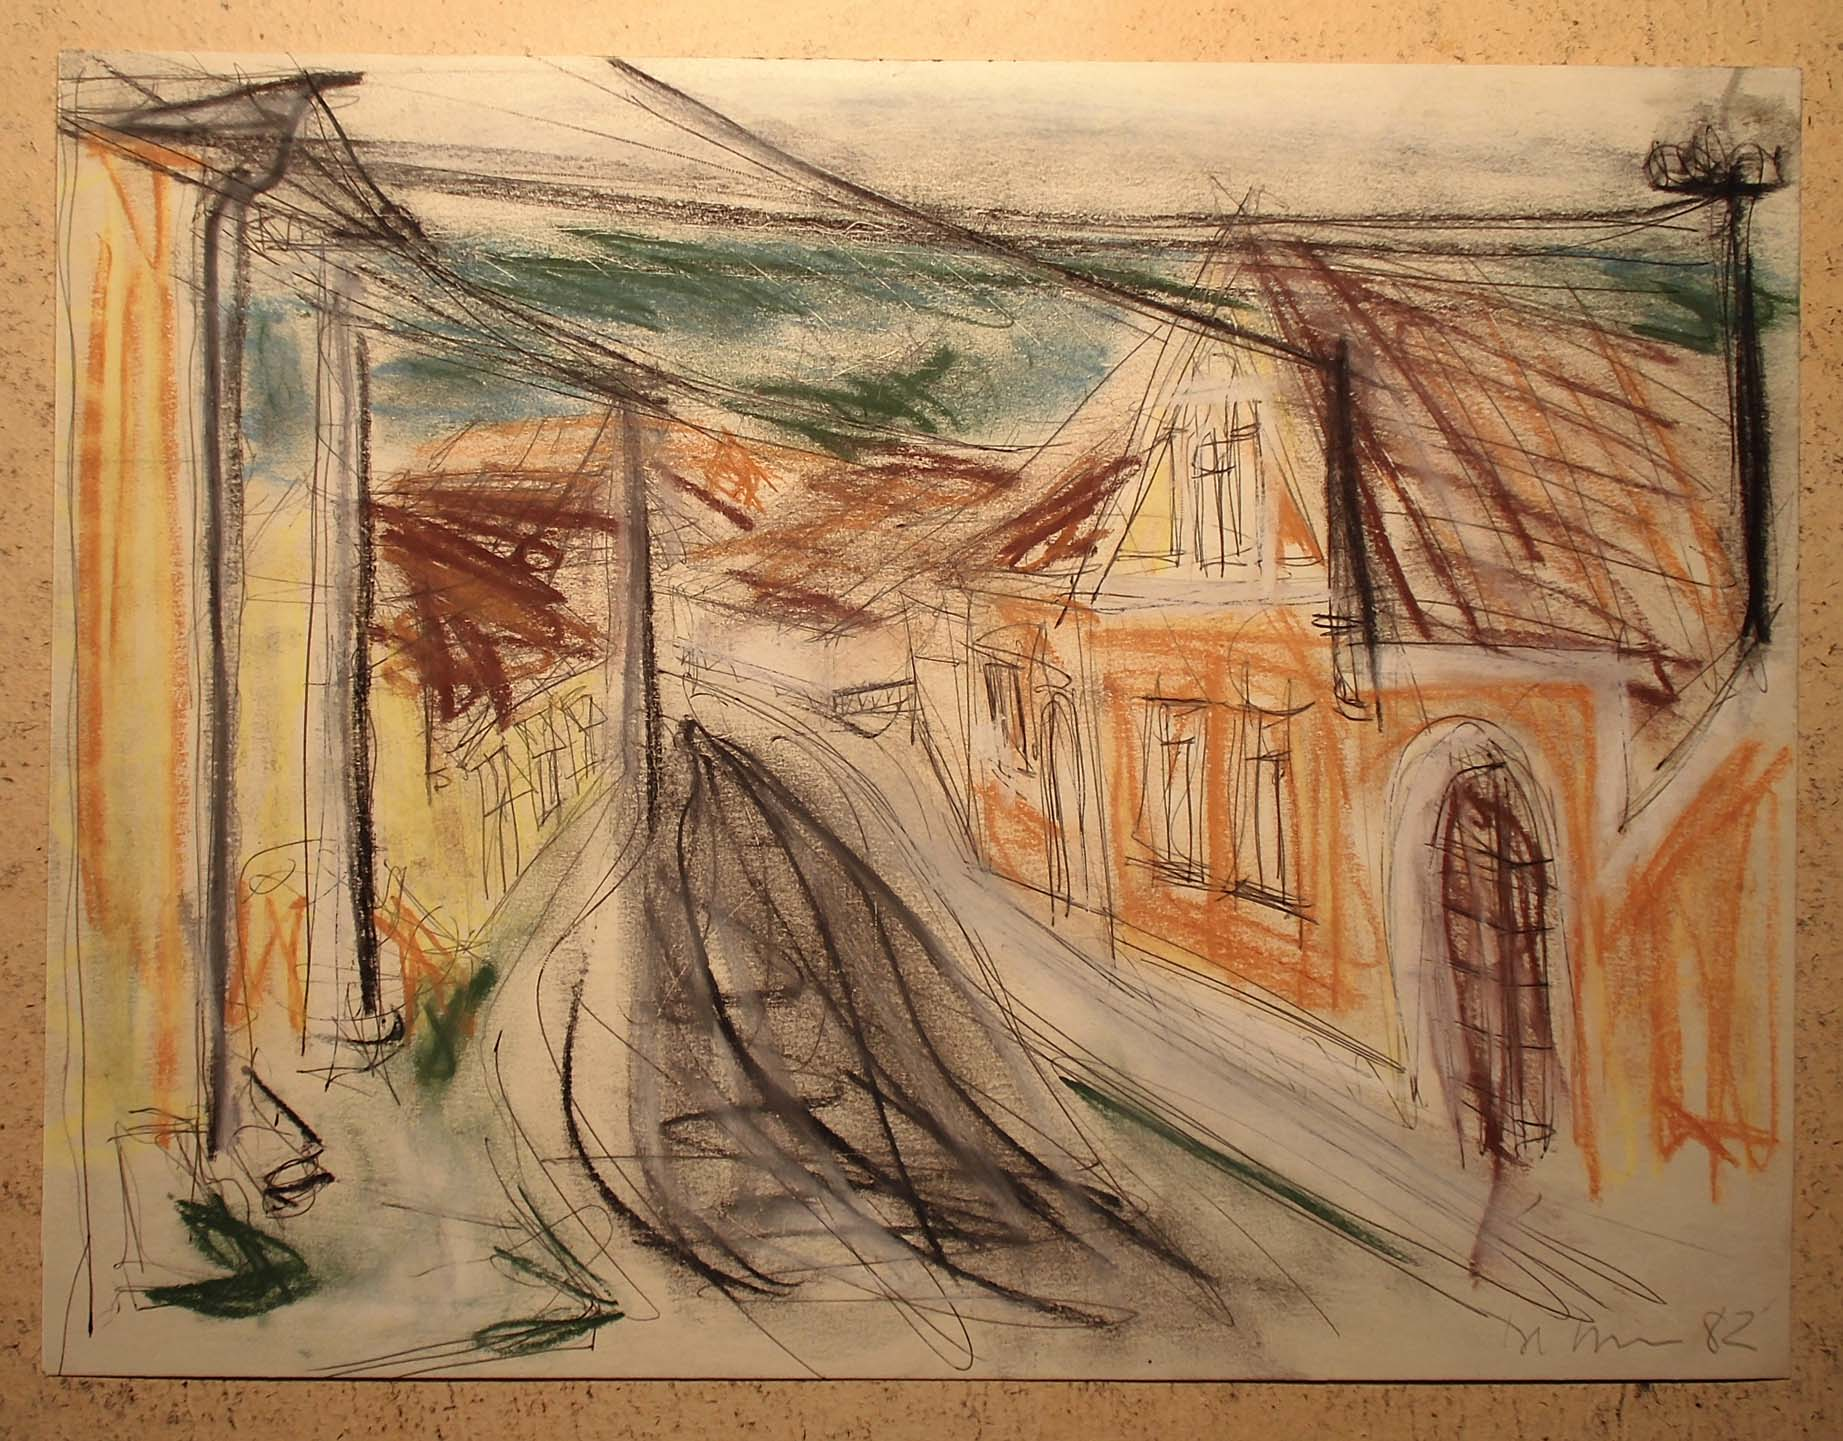 Pankpress Pastell In böhmischen Dörfern VI Peter Dettmann 1982